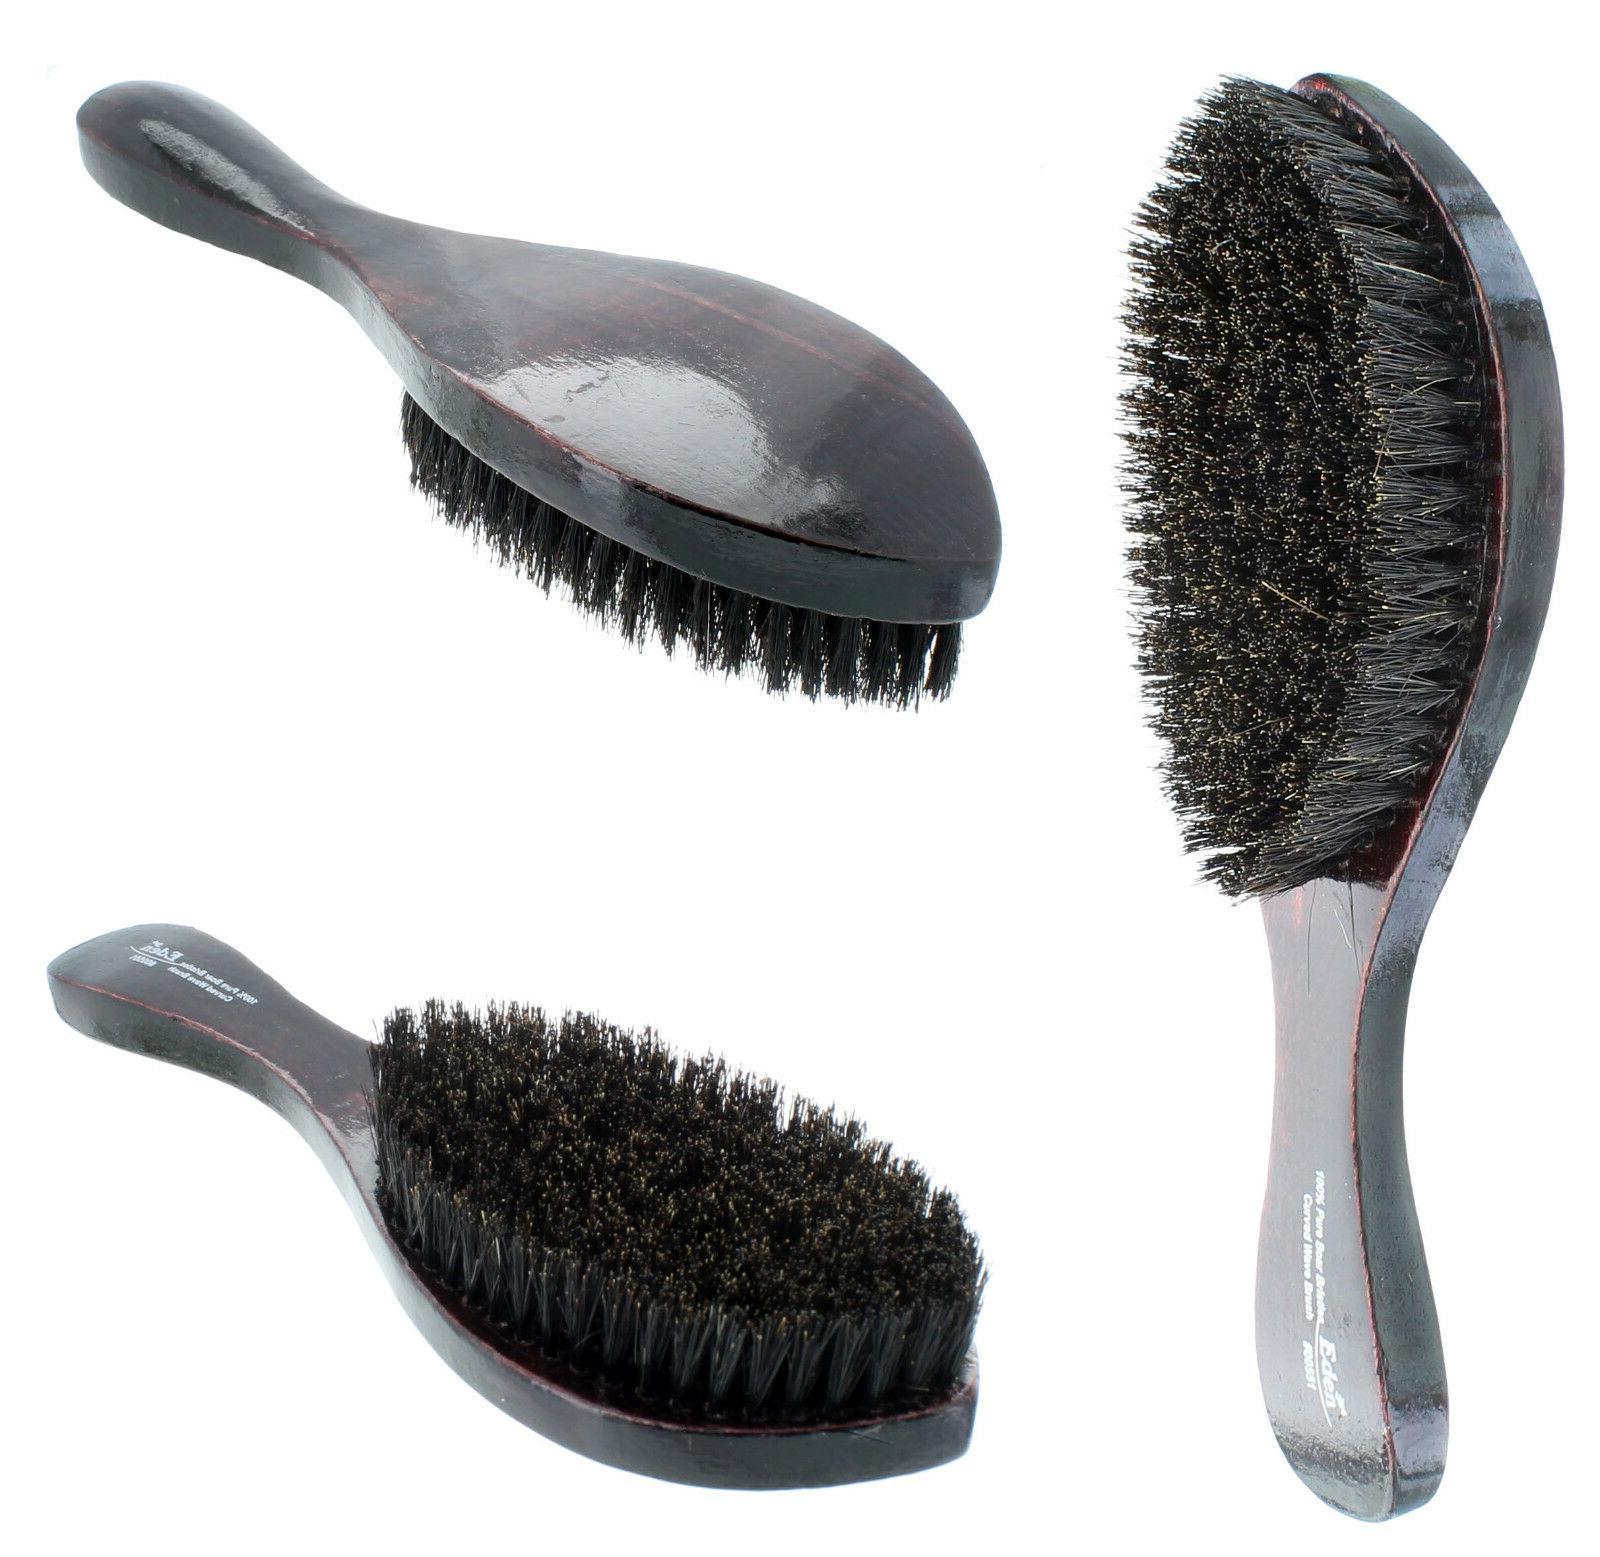 curved soft boar bristle wave hair brush